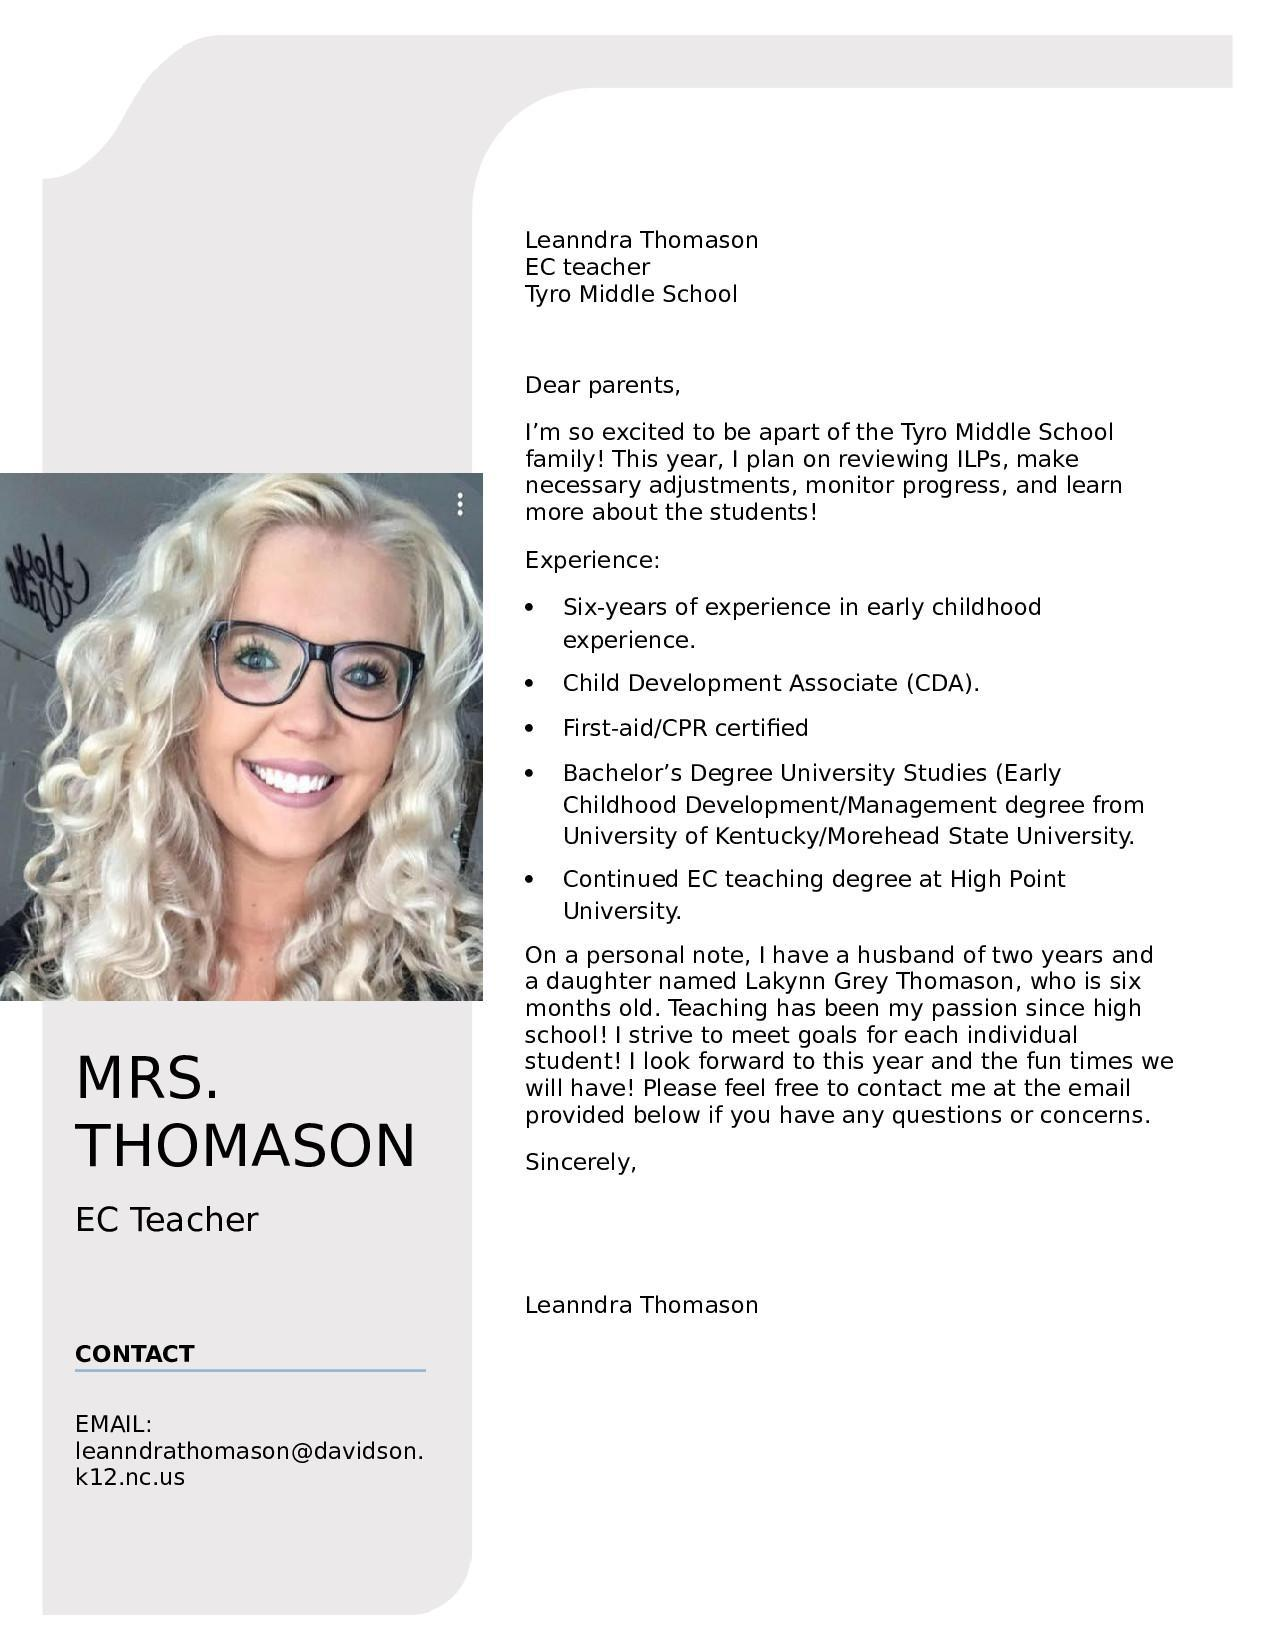 Leanndra Thomason